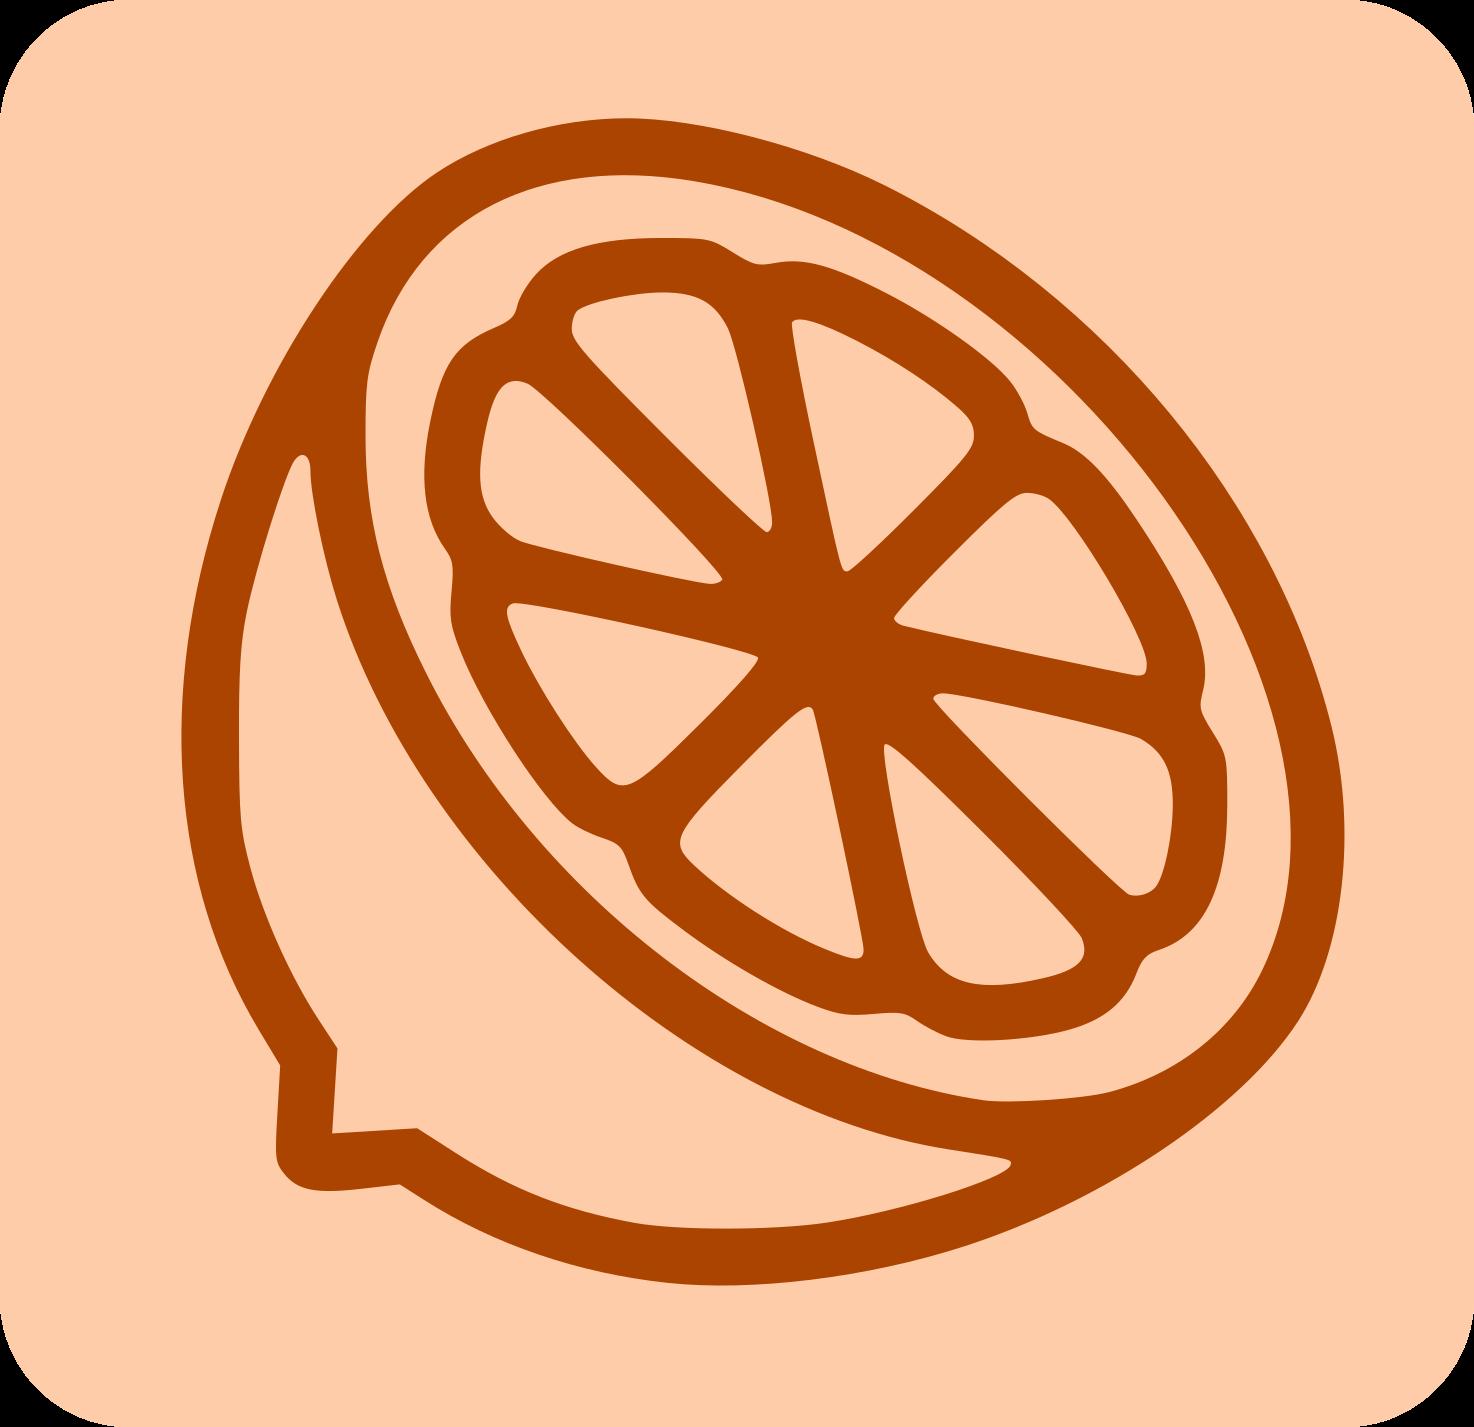 Icone d'una taronja o llimona